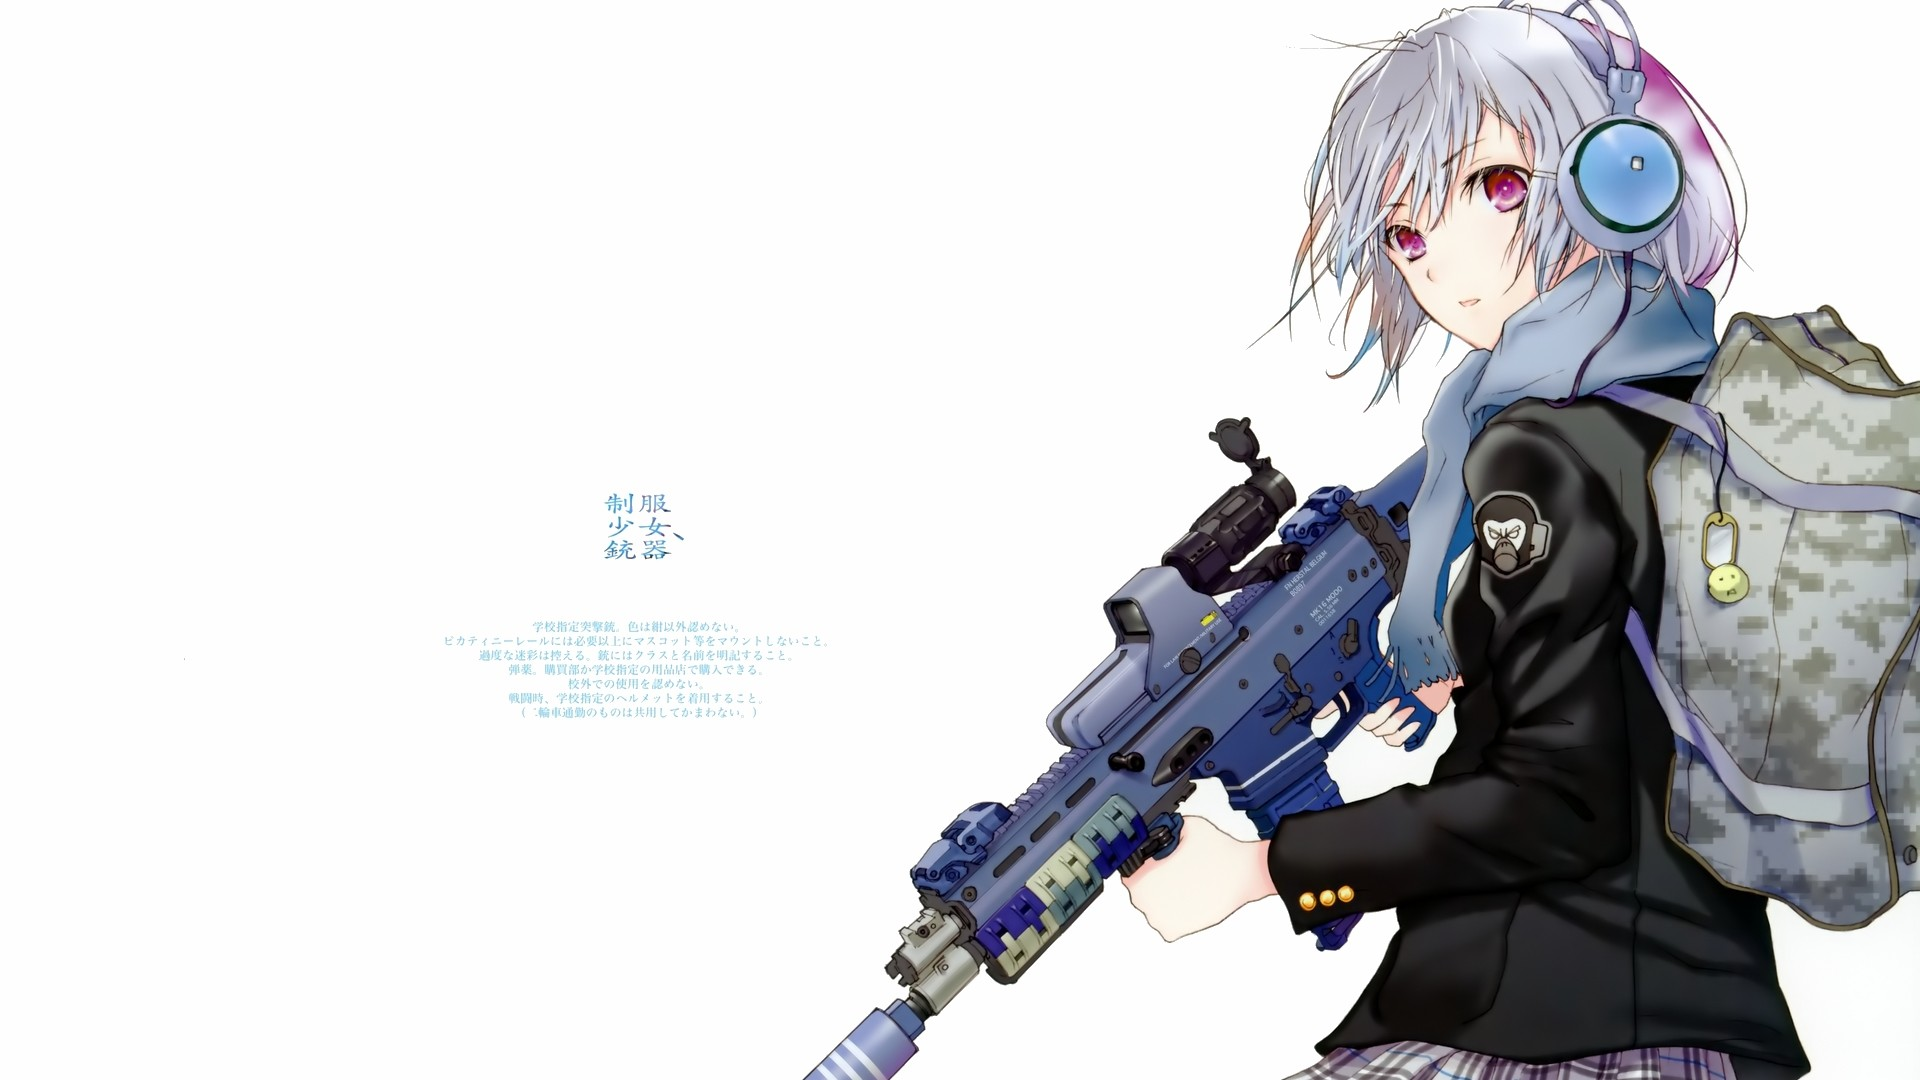 #Anime girls with #guns | anime gun | Pinterest | Anime